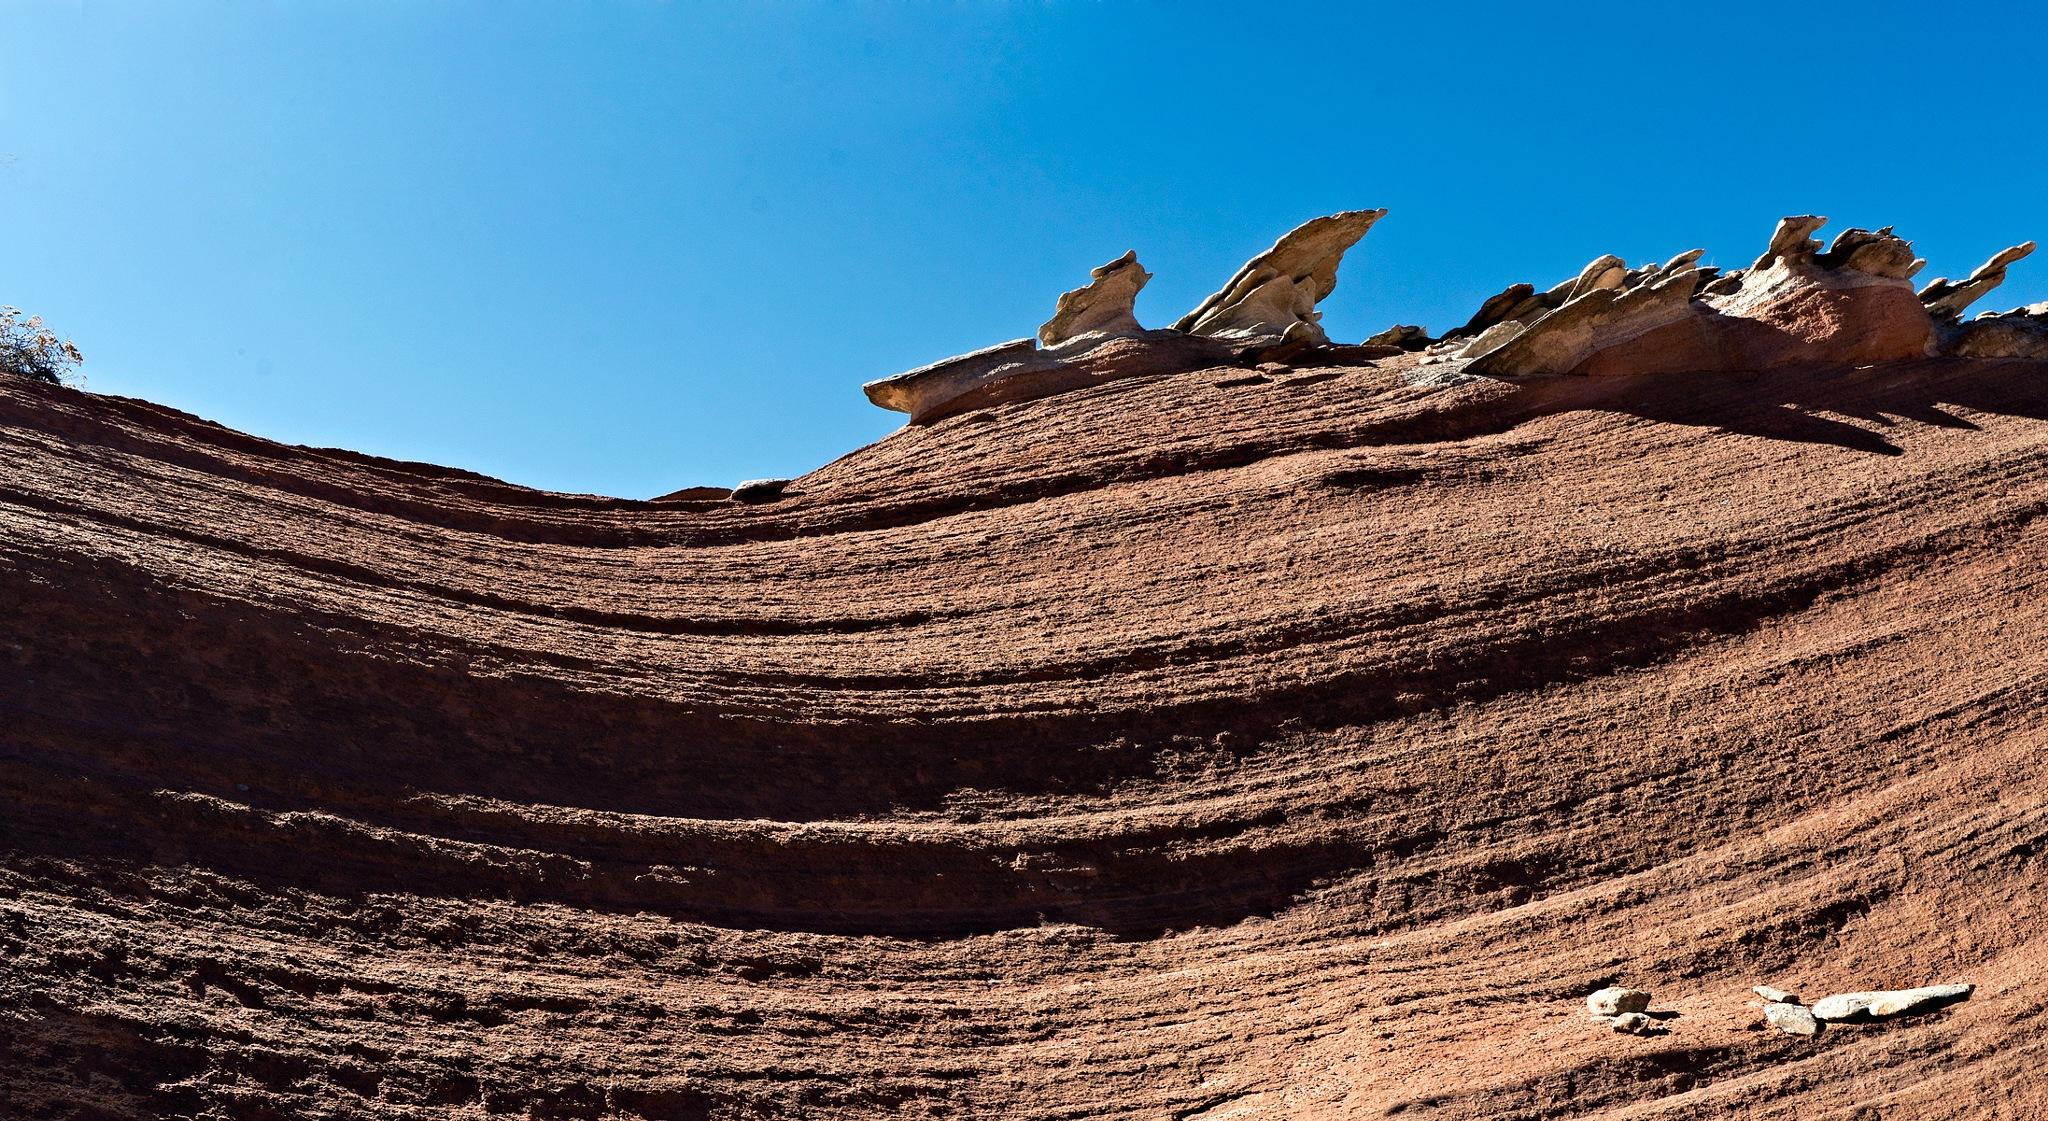 Desert Wave by Bret Little